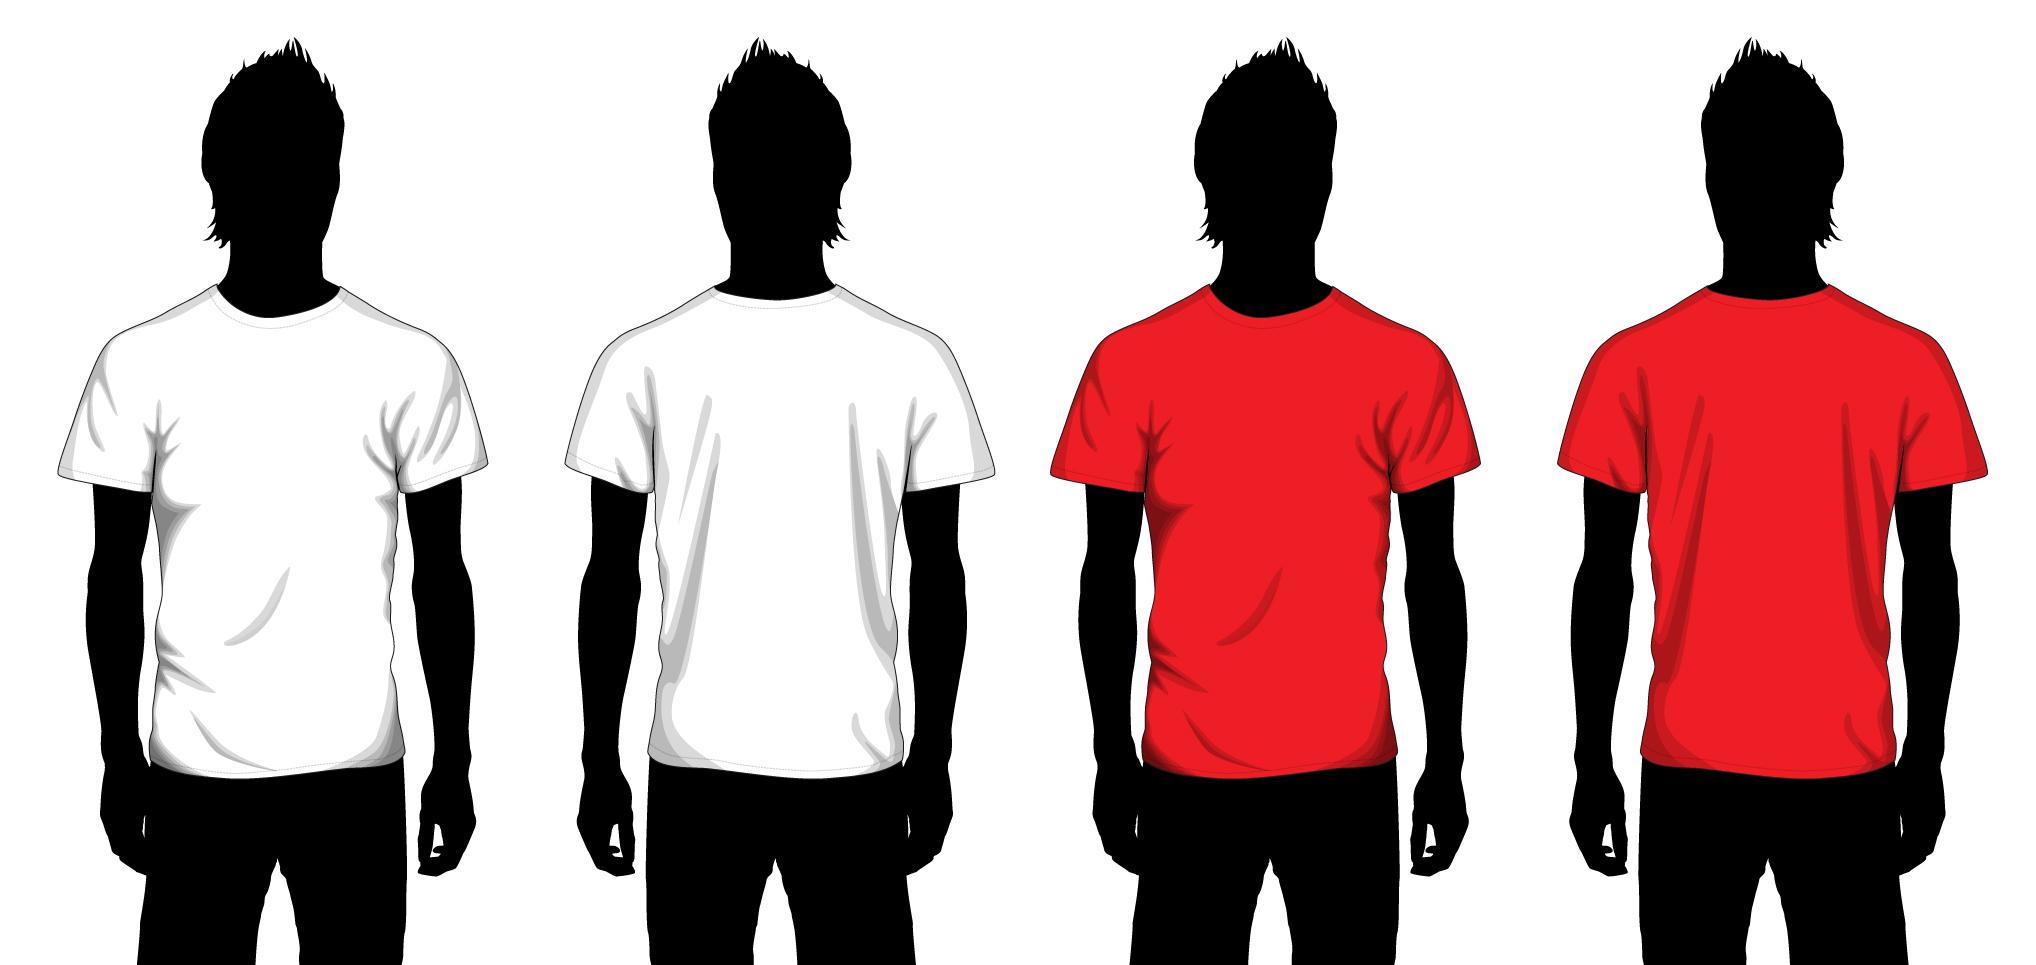 Royalty Free T Shirt Designs.